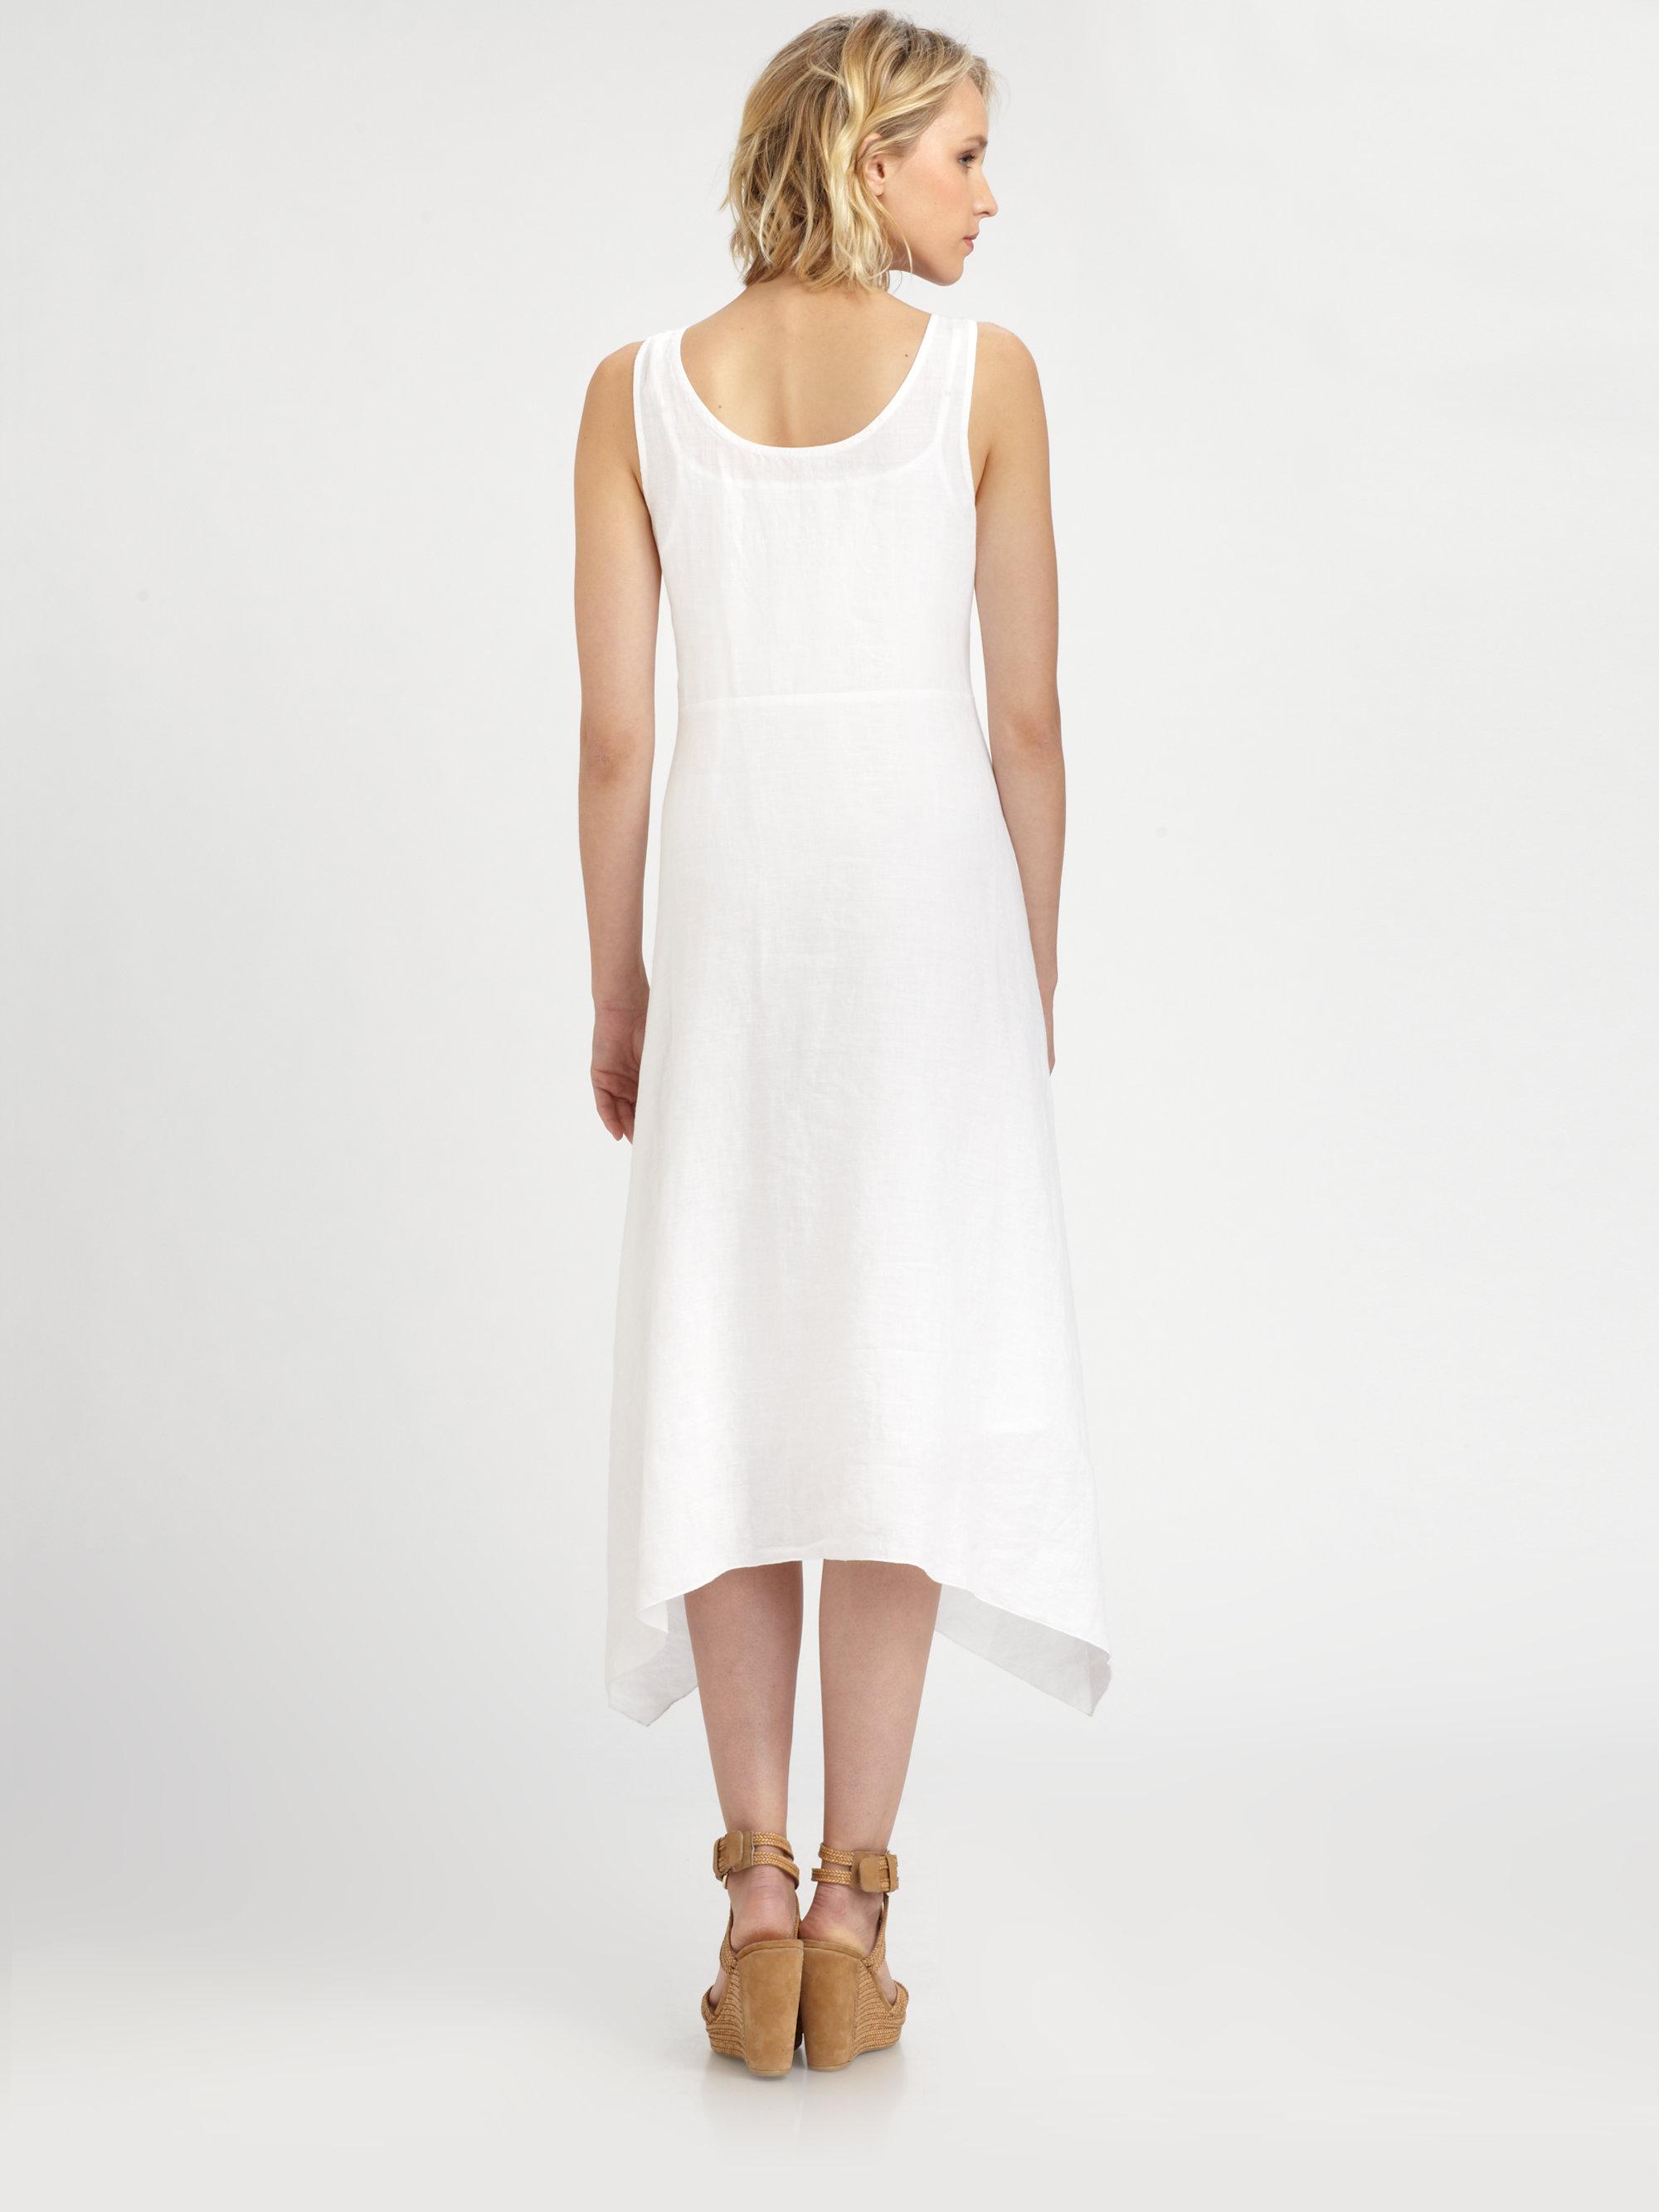 Lyst - Eileen Fisher Irish Linen Sleeveless Dress in White